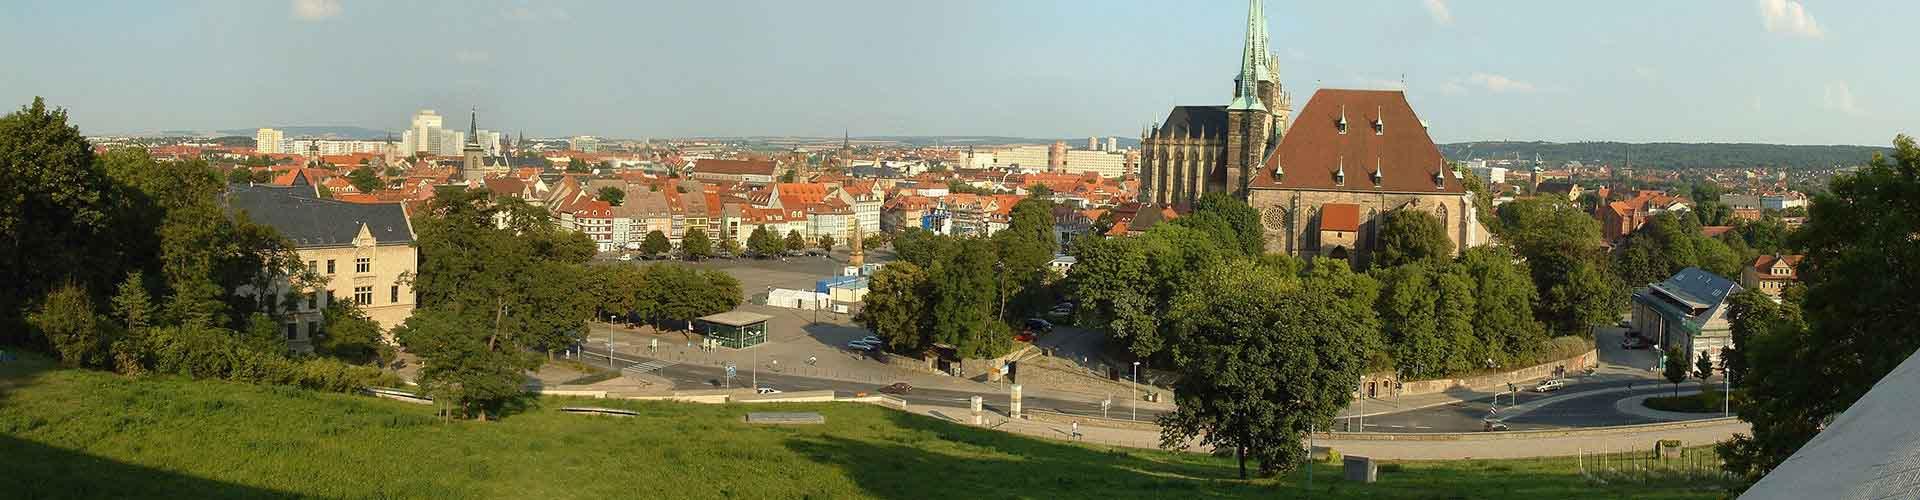 Erfurt - Habitaciones en Erfurt. Mapas de Erfurt, Fotos y comentarios de cada Habitación en Erfurt.